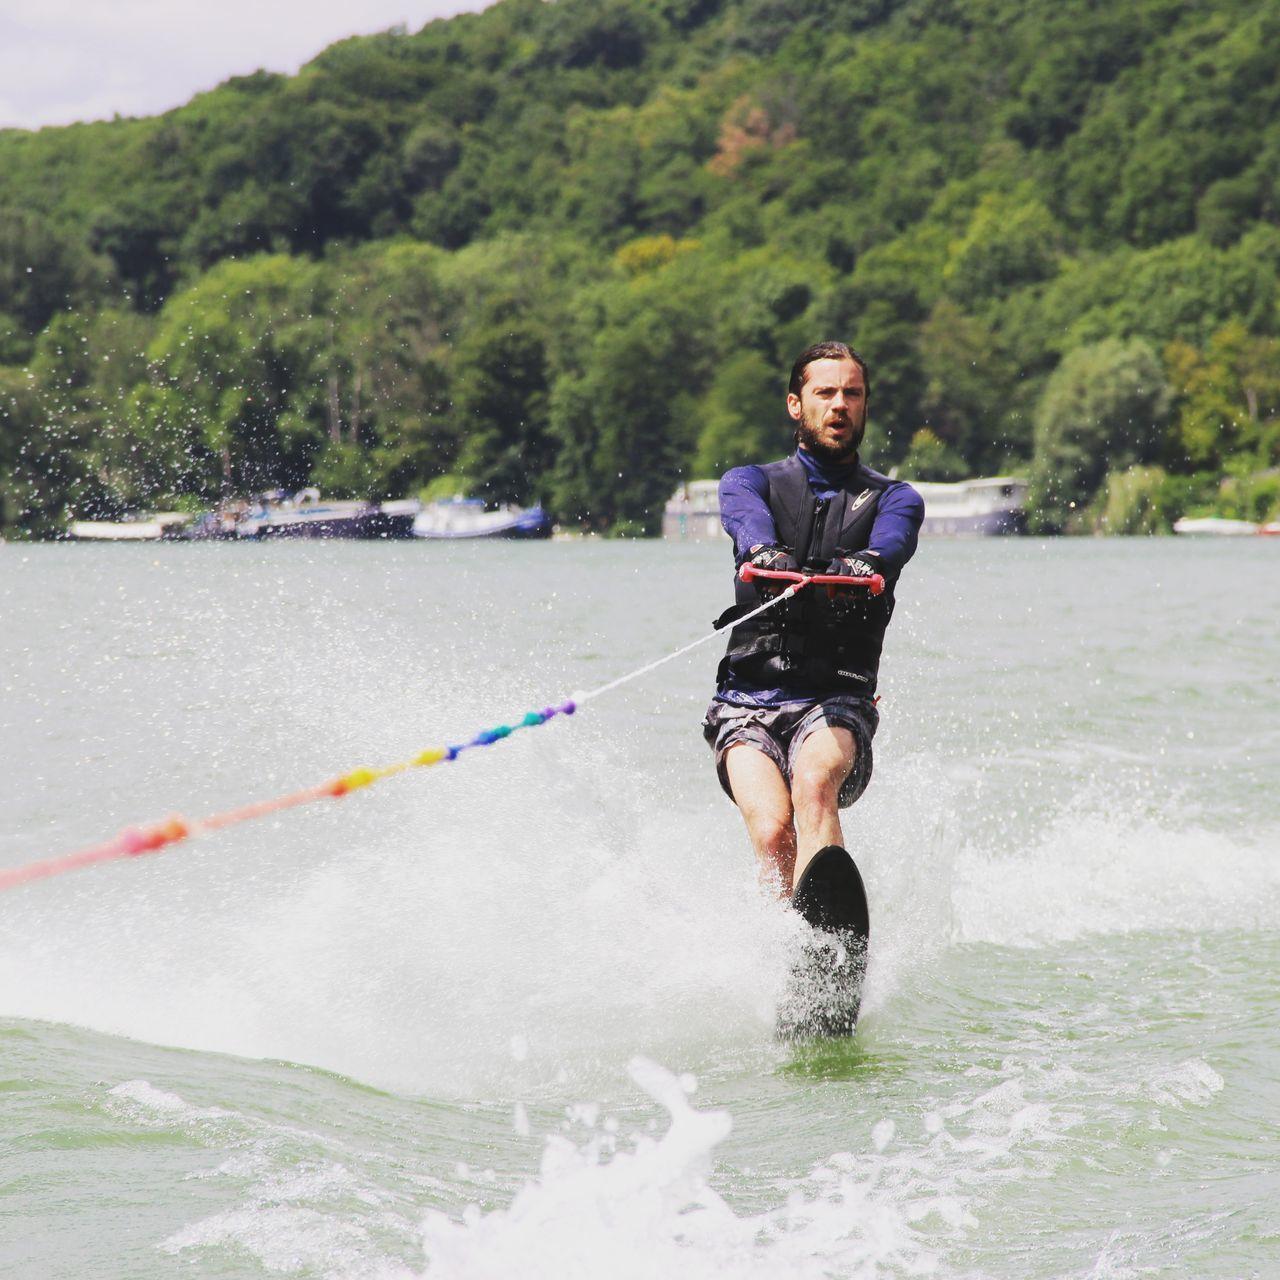 Man Waterskiing In River